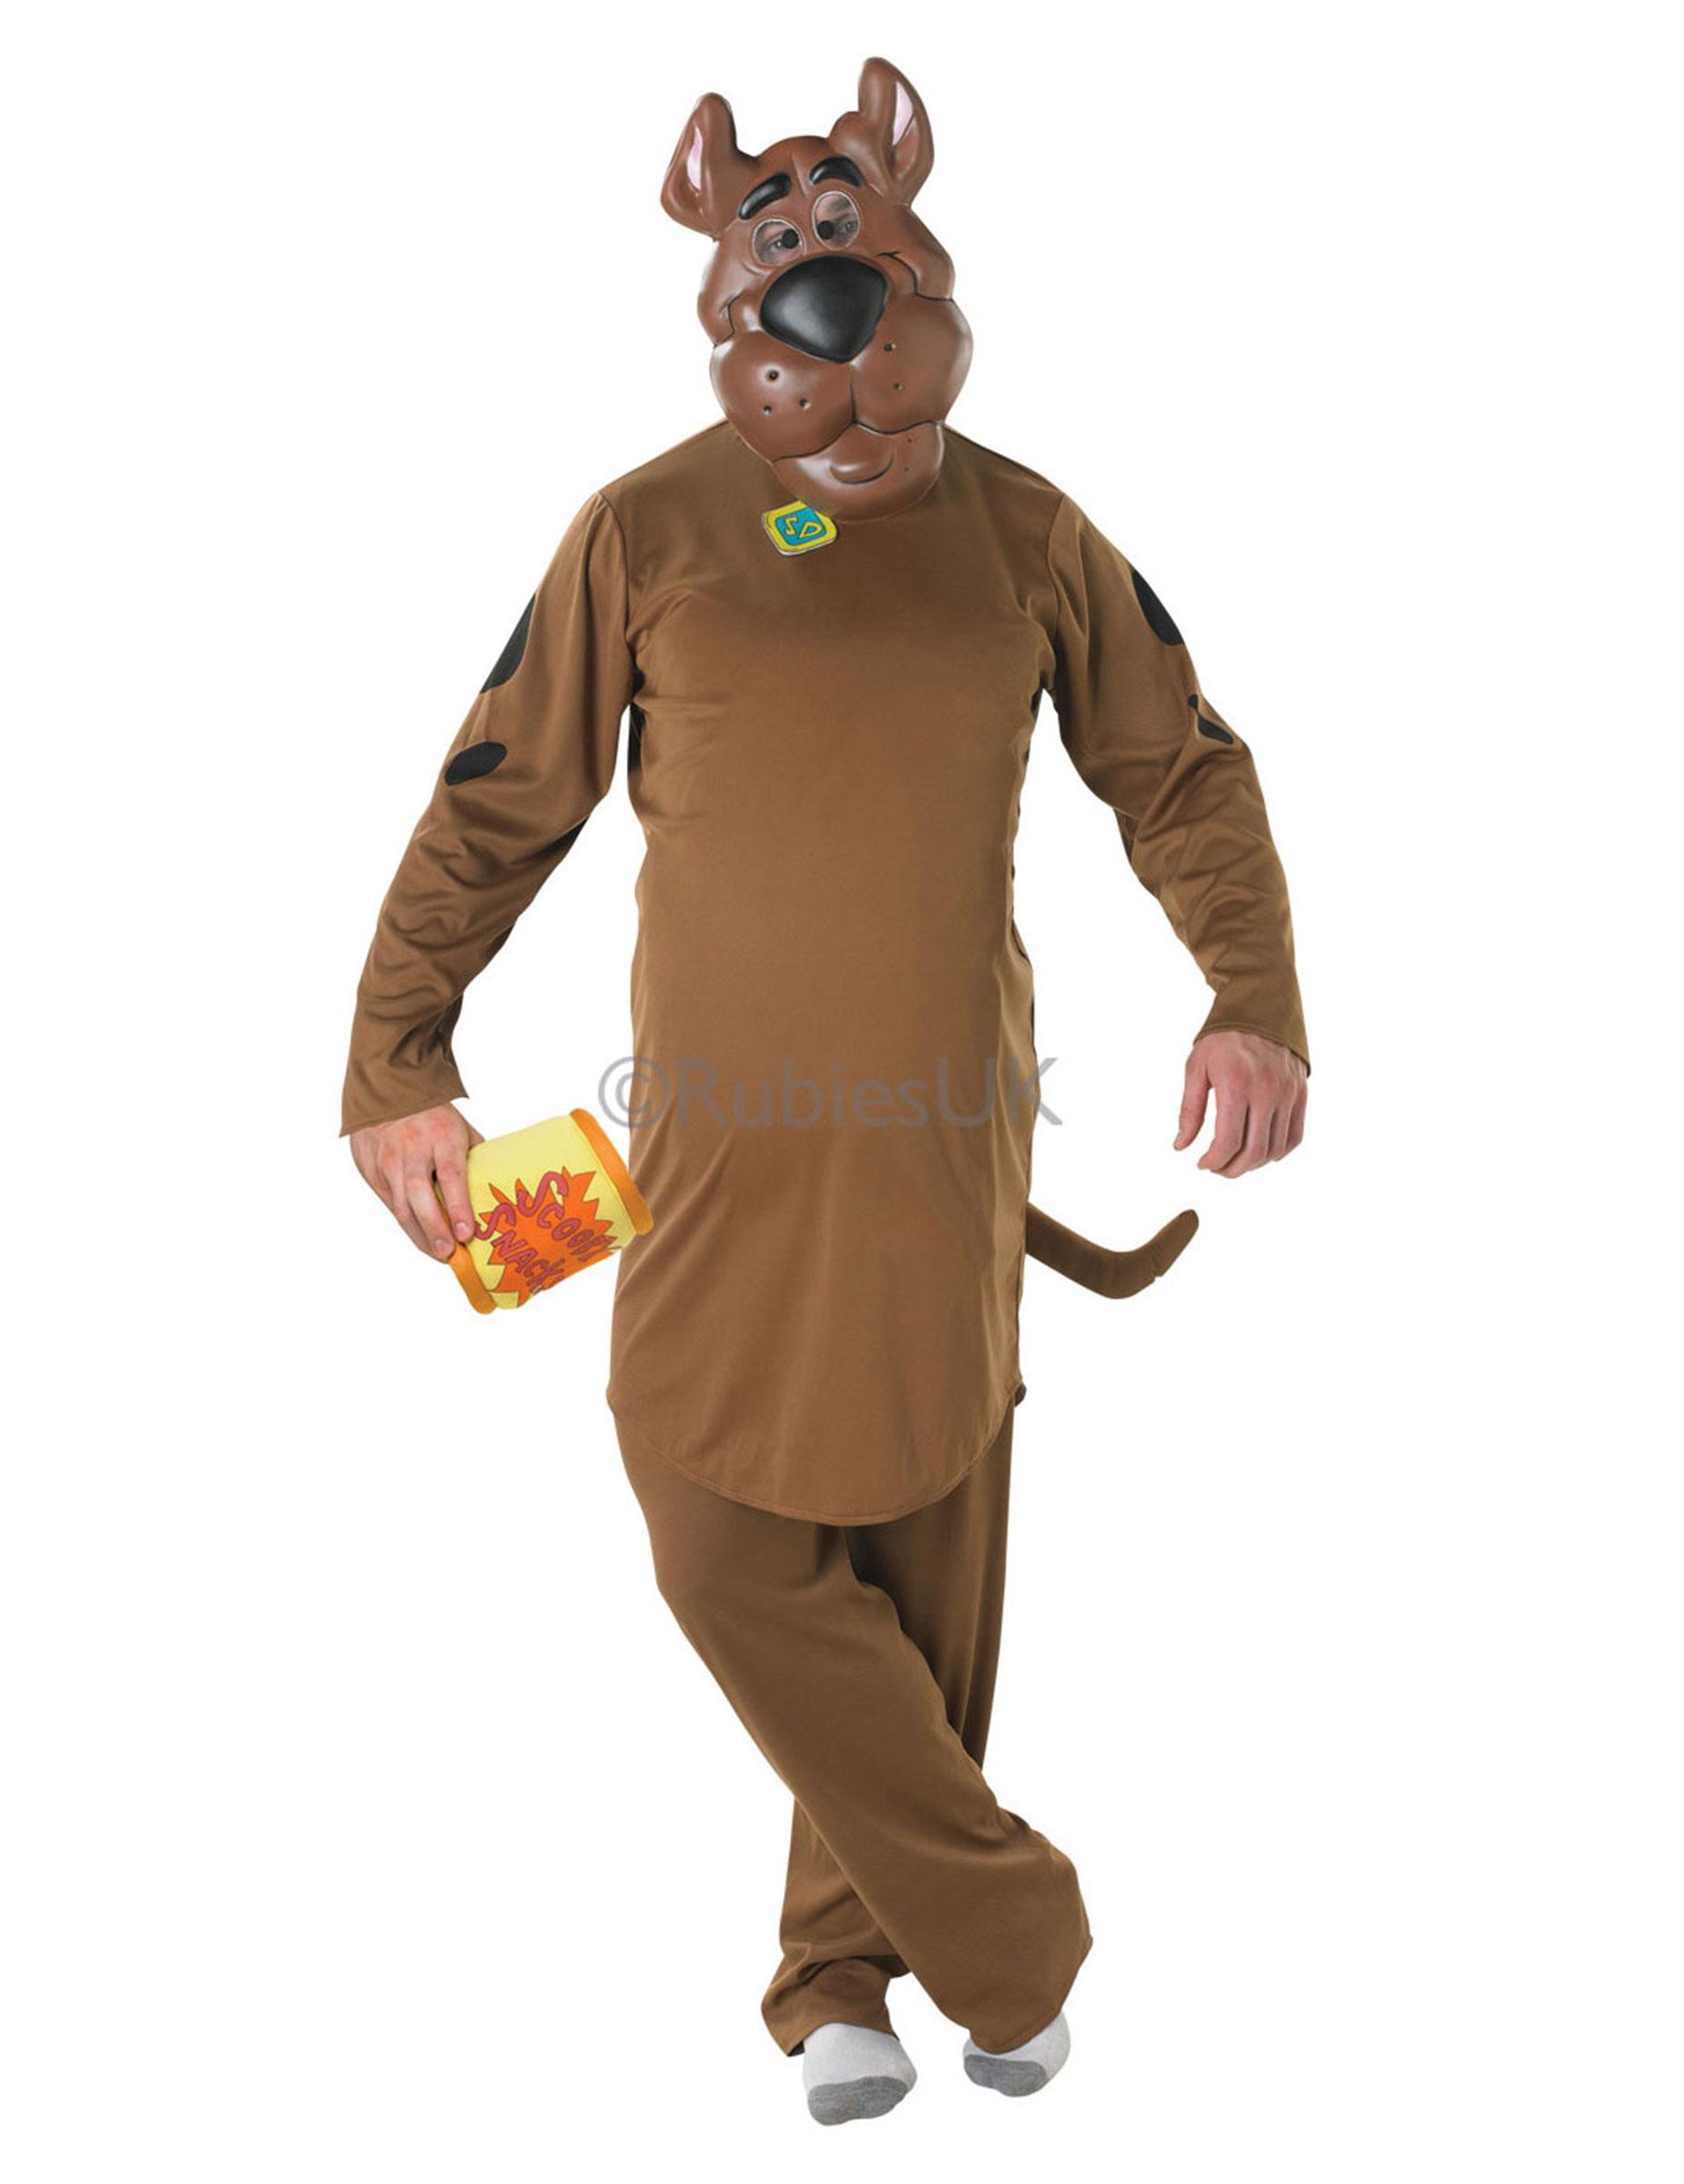 Shaggy Costume PARRUCCA Costume Scooby Doo cartoon uomo Halloween Adulto Vestito